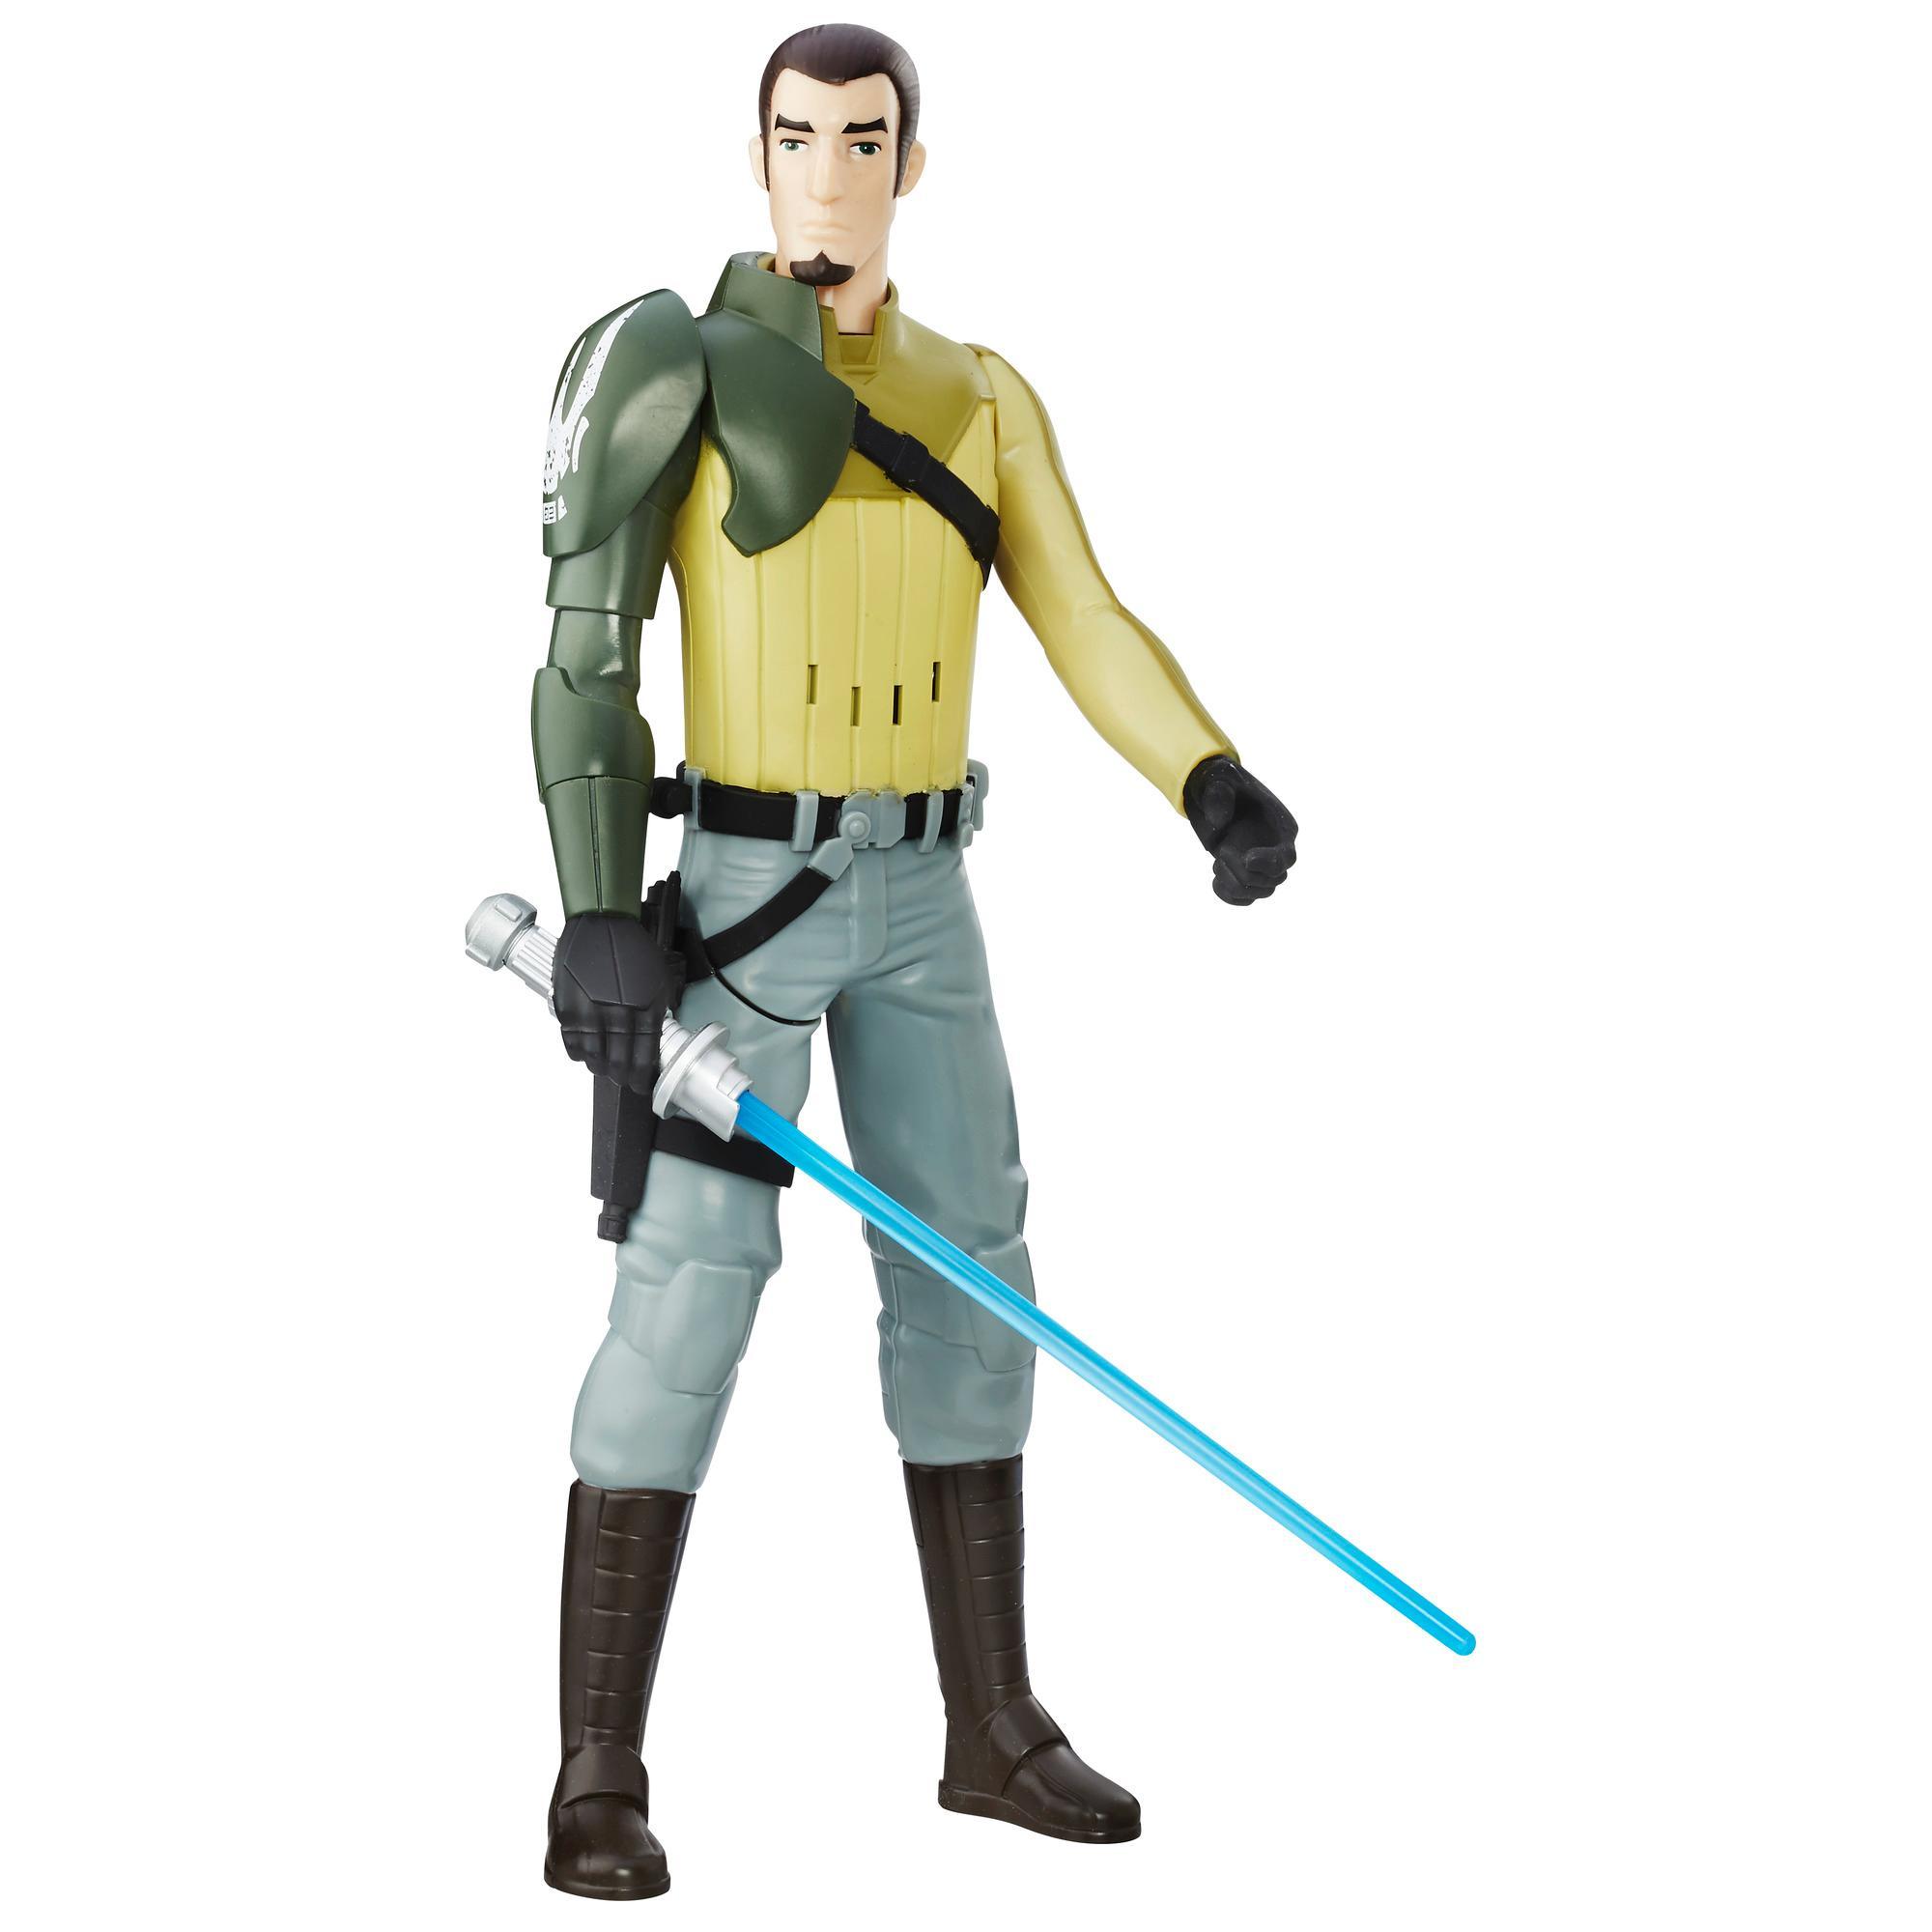 Star Wars Rebels - Kanan Jarrus Duelo electrónico